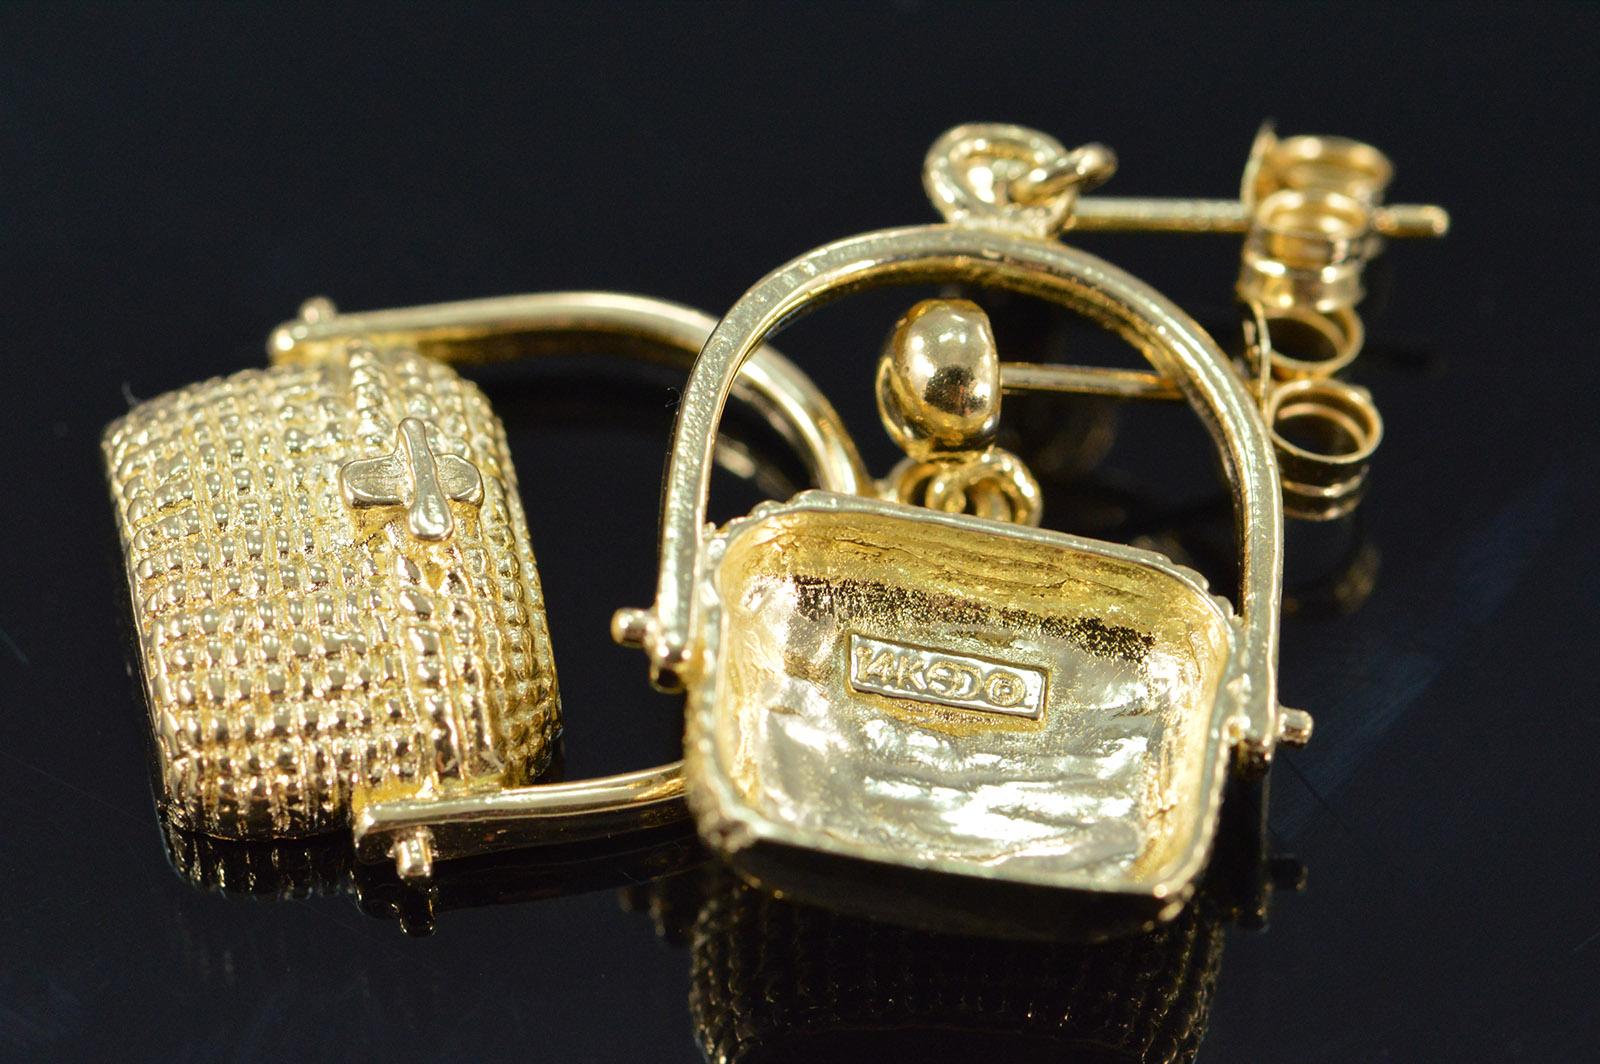 14k 5 6g Nantucket Basket Yellow Gold Earrings